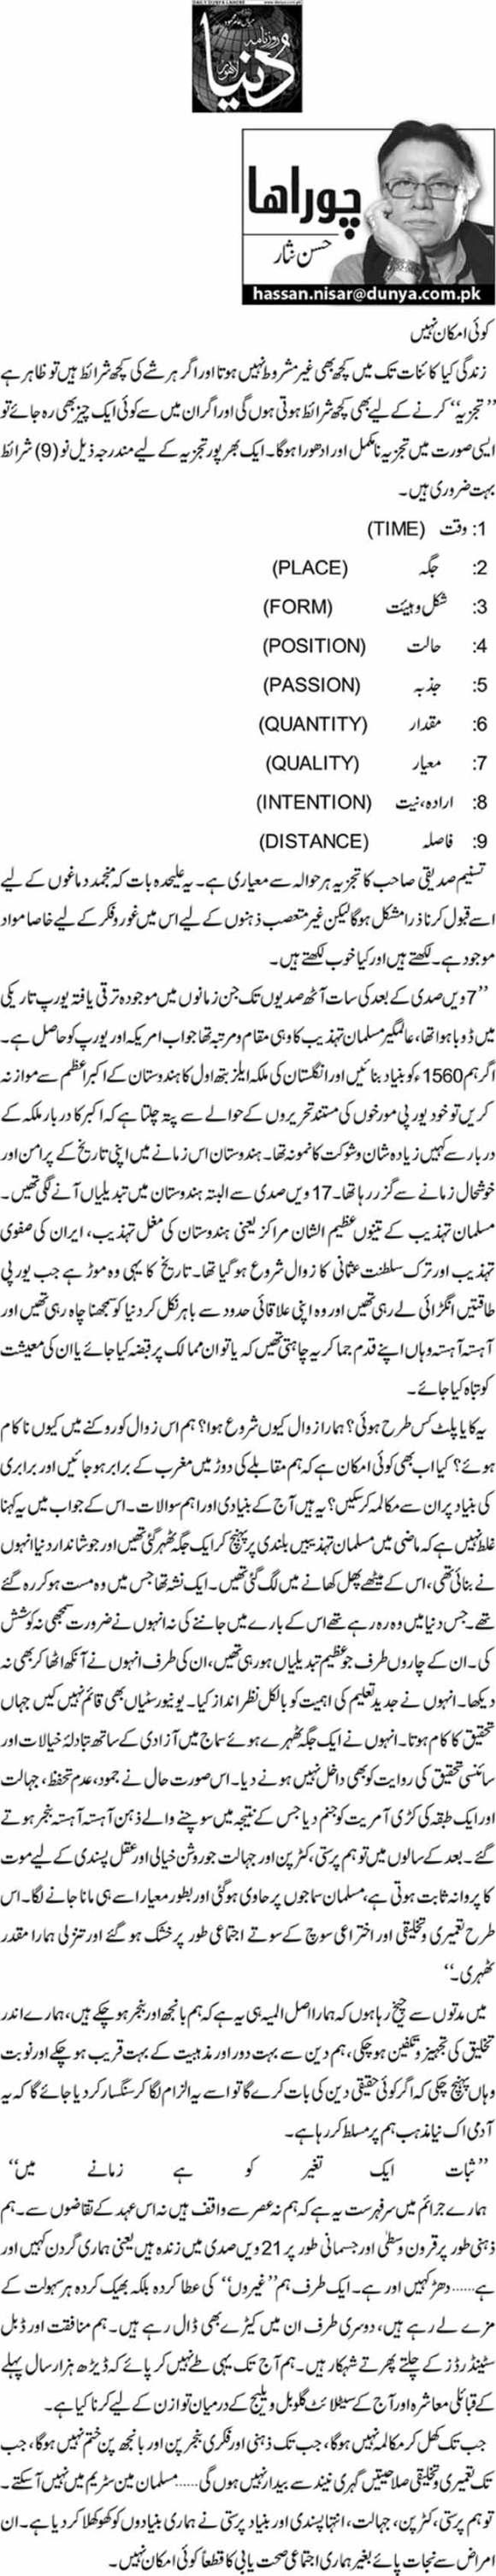 Koi imkan nahi - Hassan Nisar